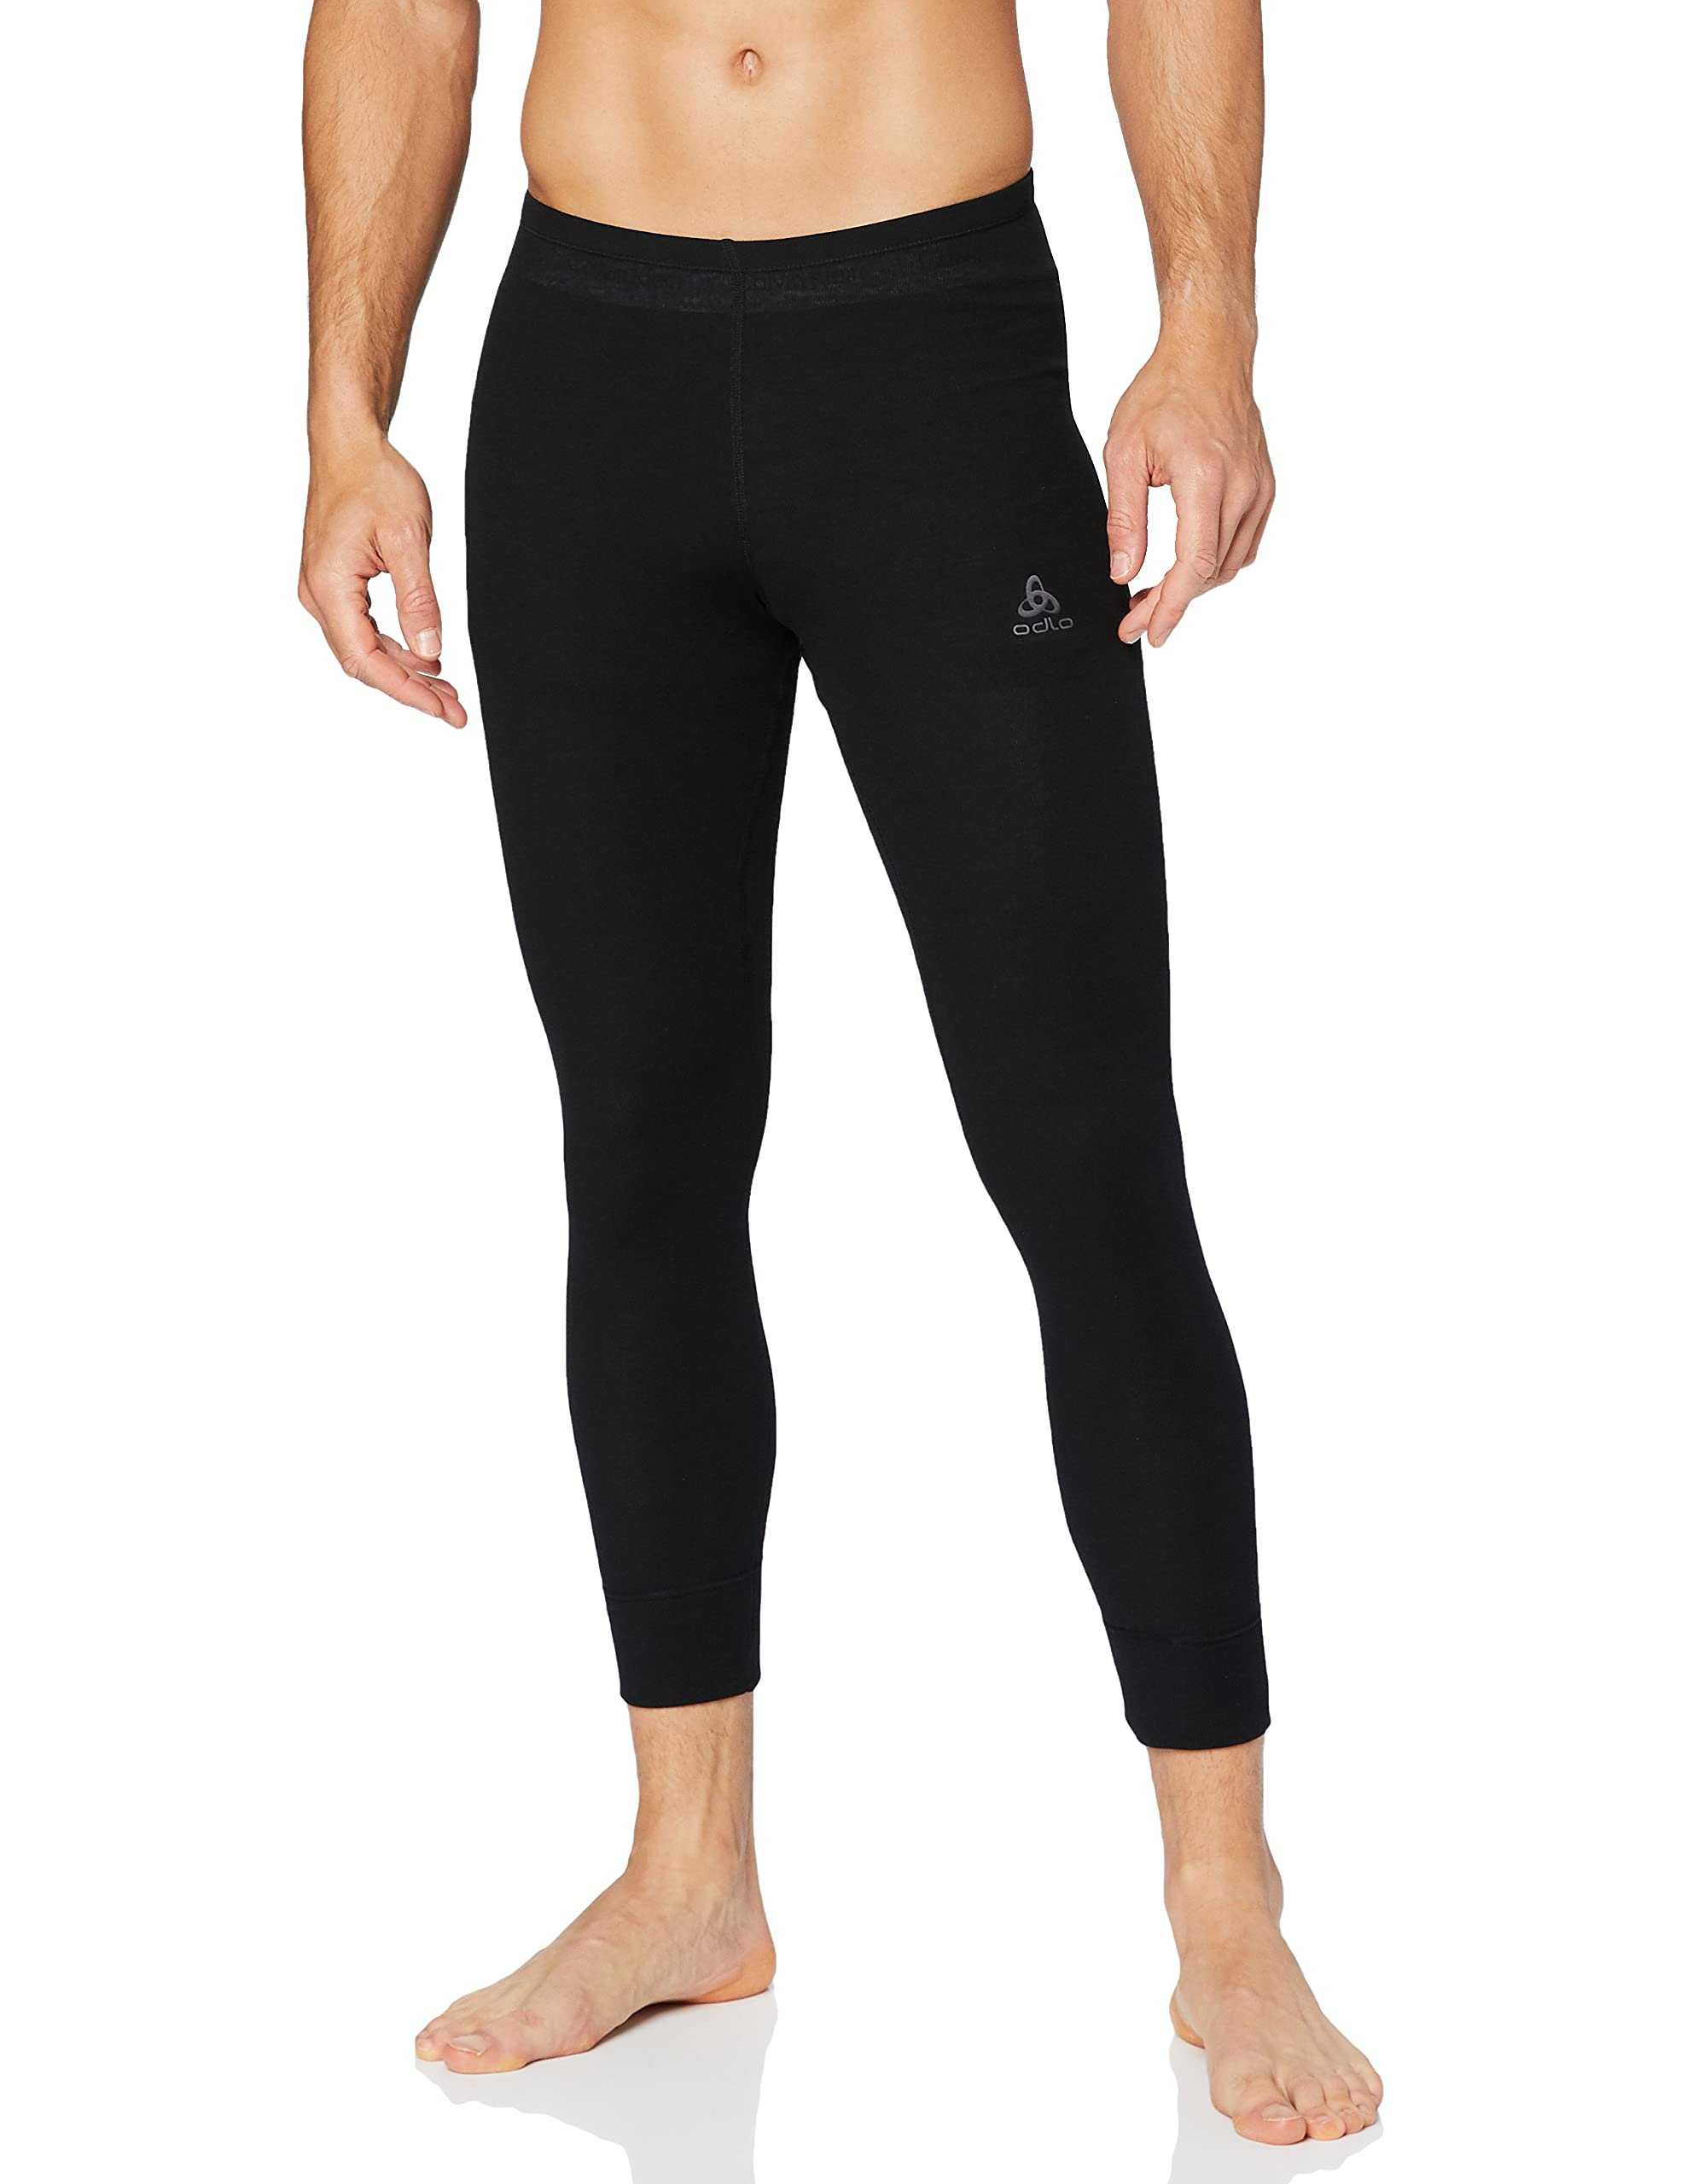 Odlo Damen Pants Warm Unterhose, Schwarz(Black), S